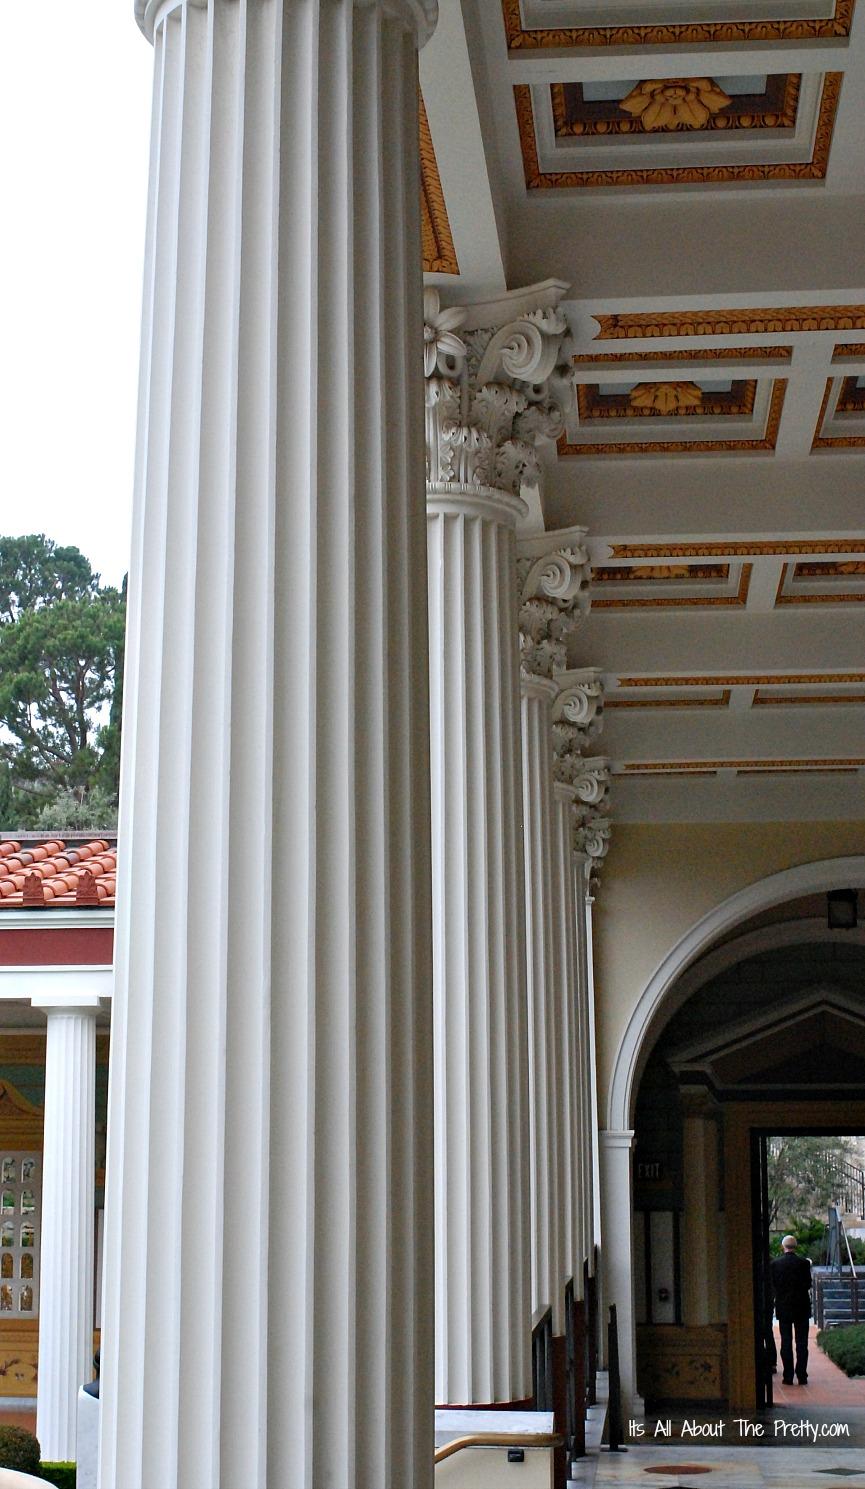 Getty Villa columns in a row